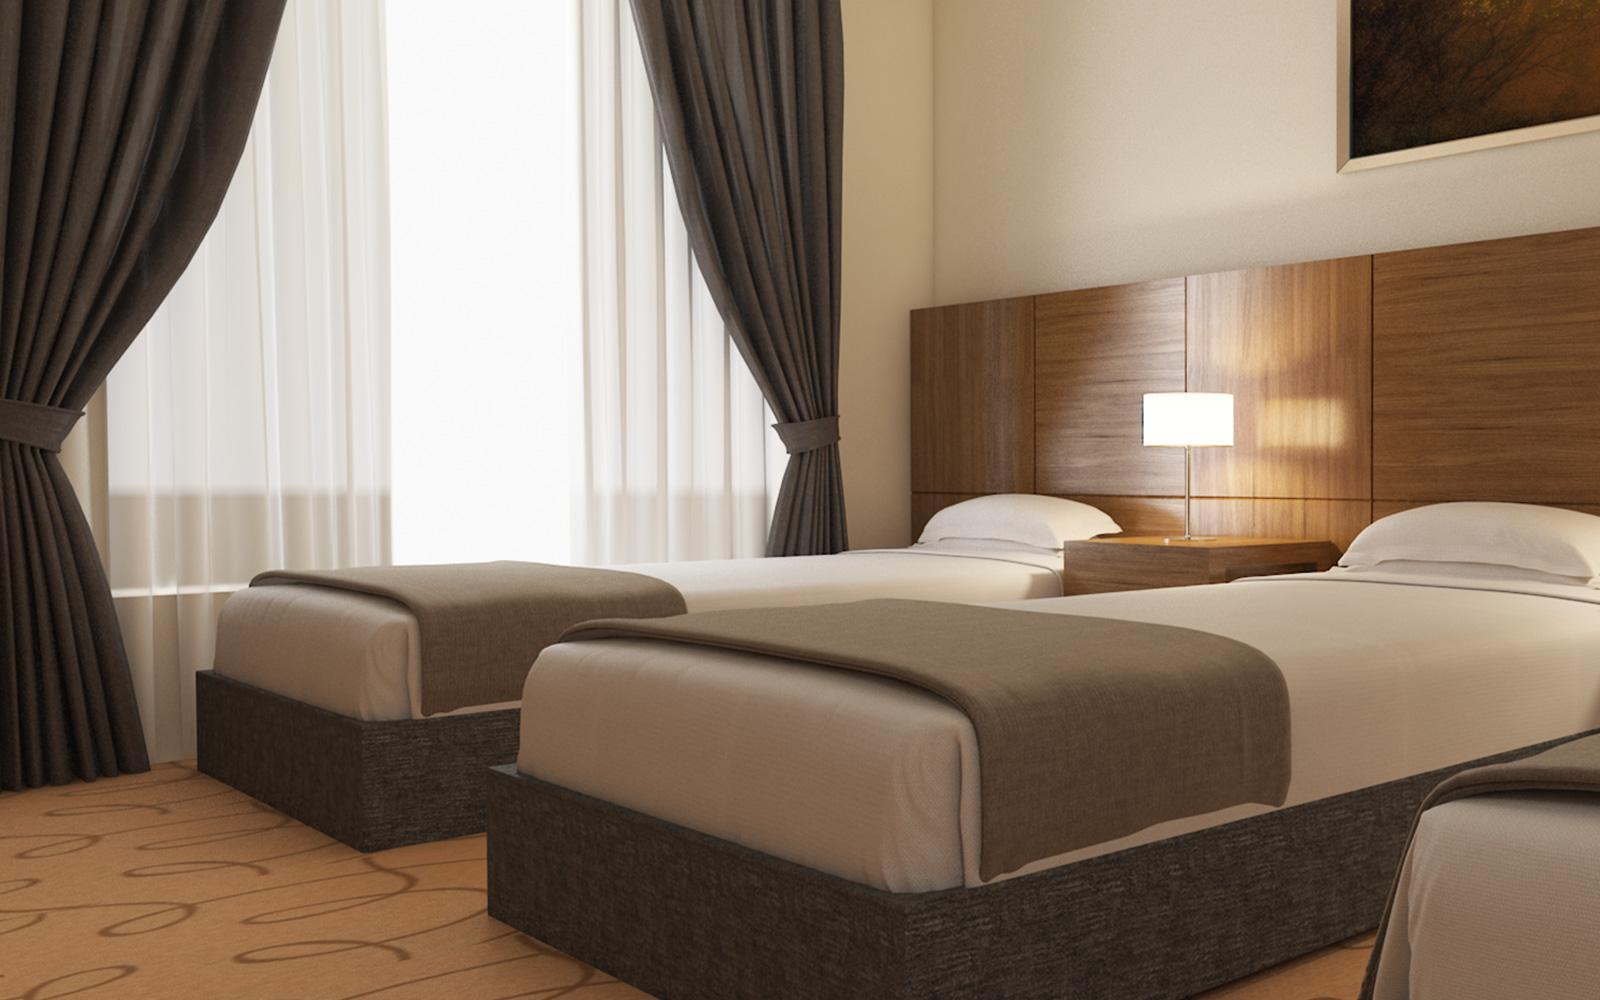 Vogue Design - Saudi Arabia Almansoury Hotel1